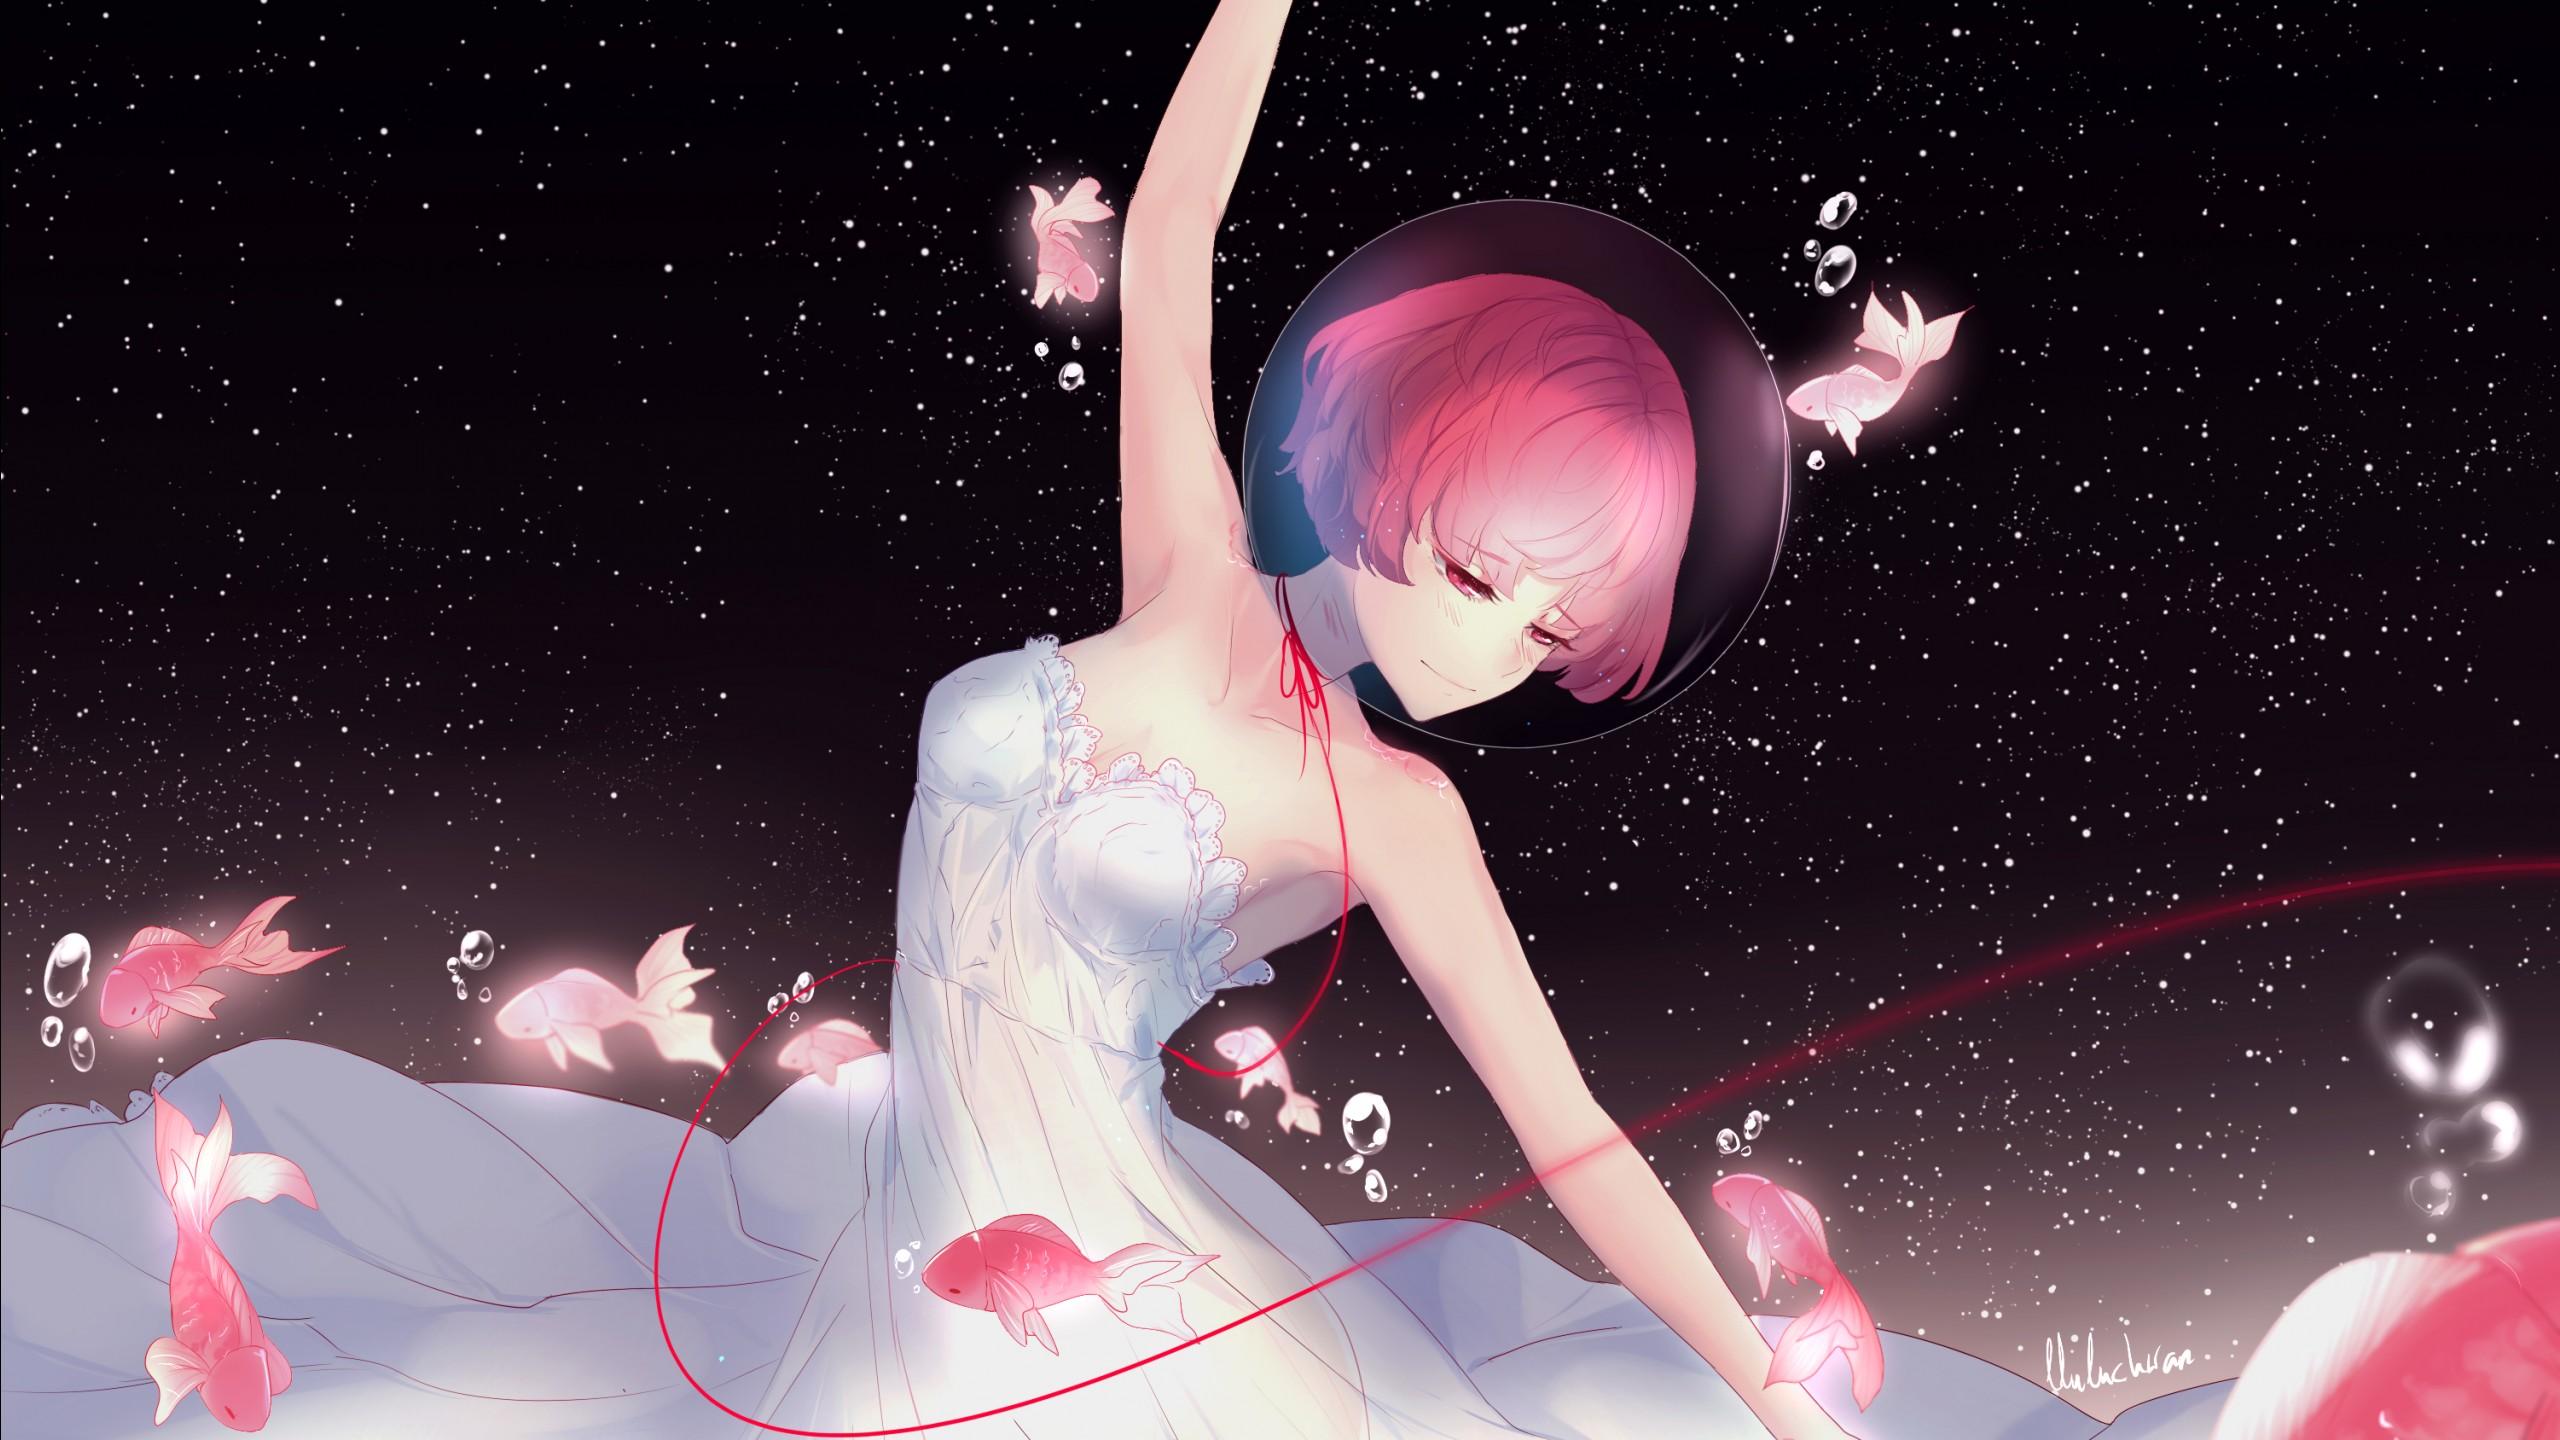 3d Dance Wallpaper Anime Girl Night Dance Wallpapers Hd Wallpapers Id 25507